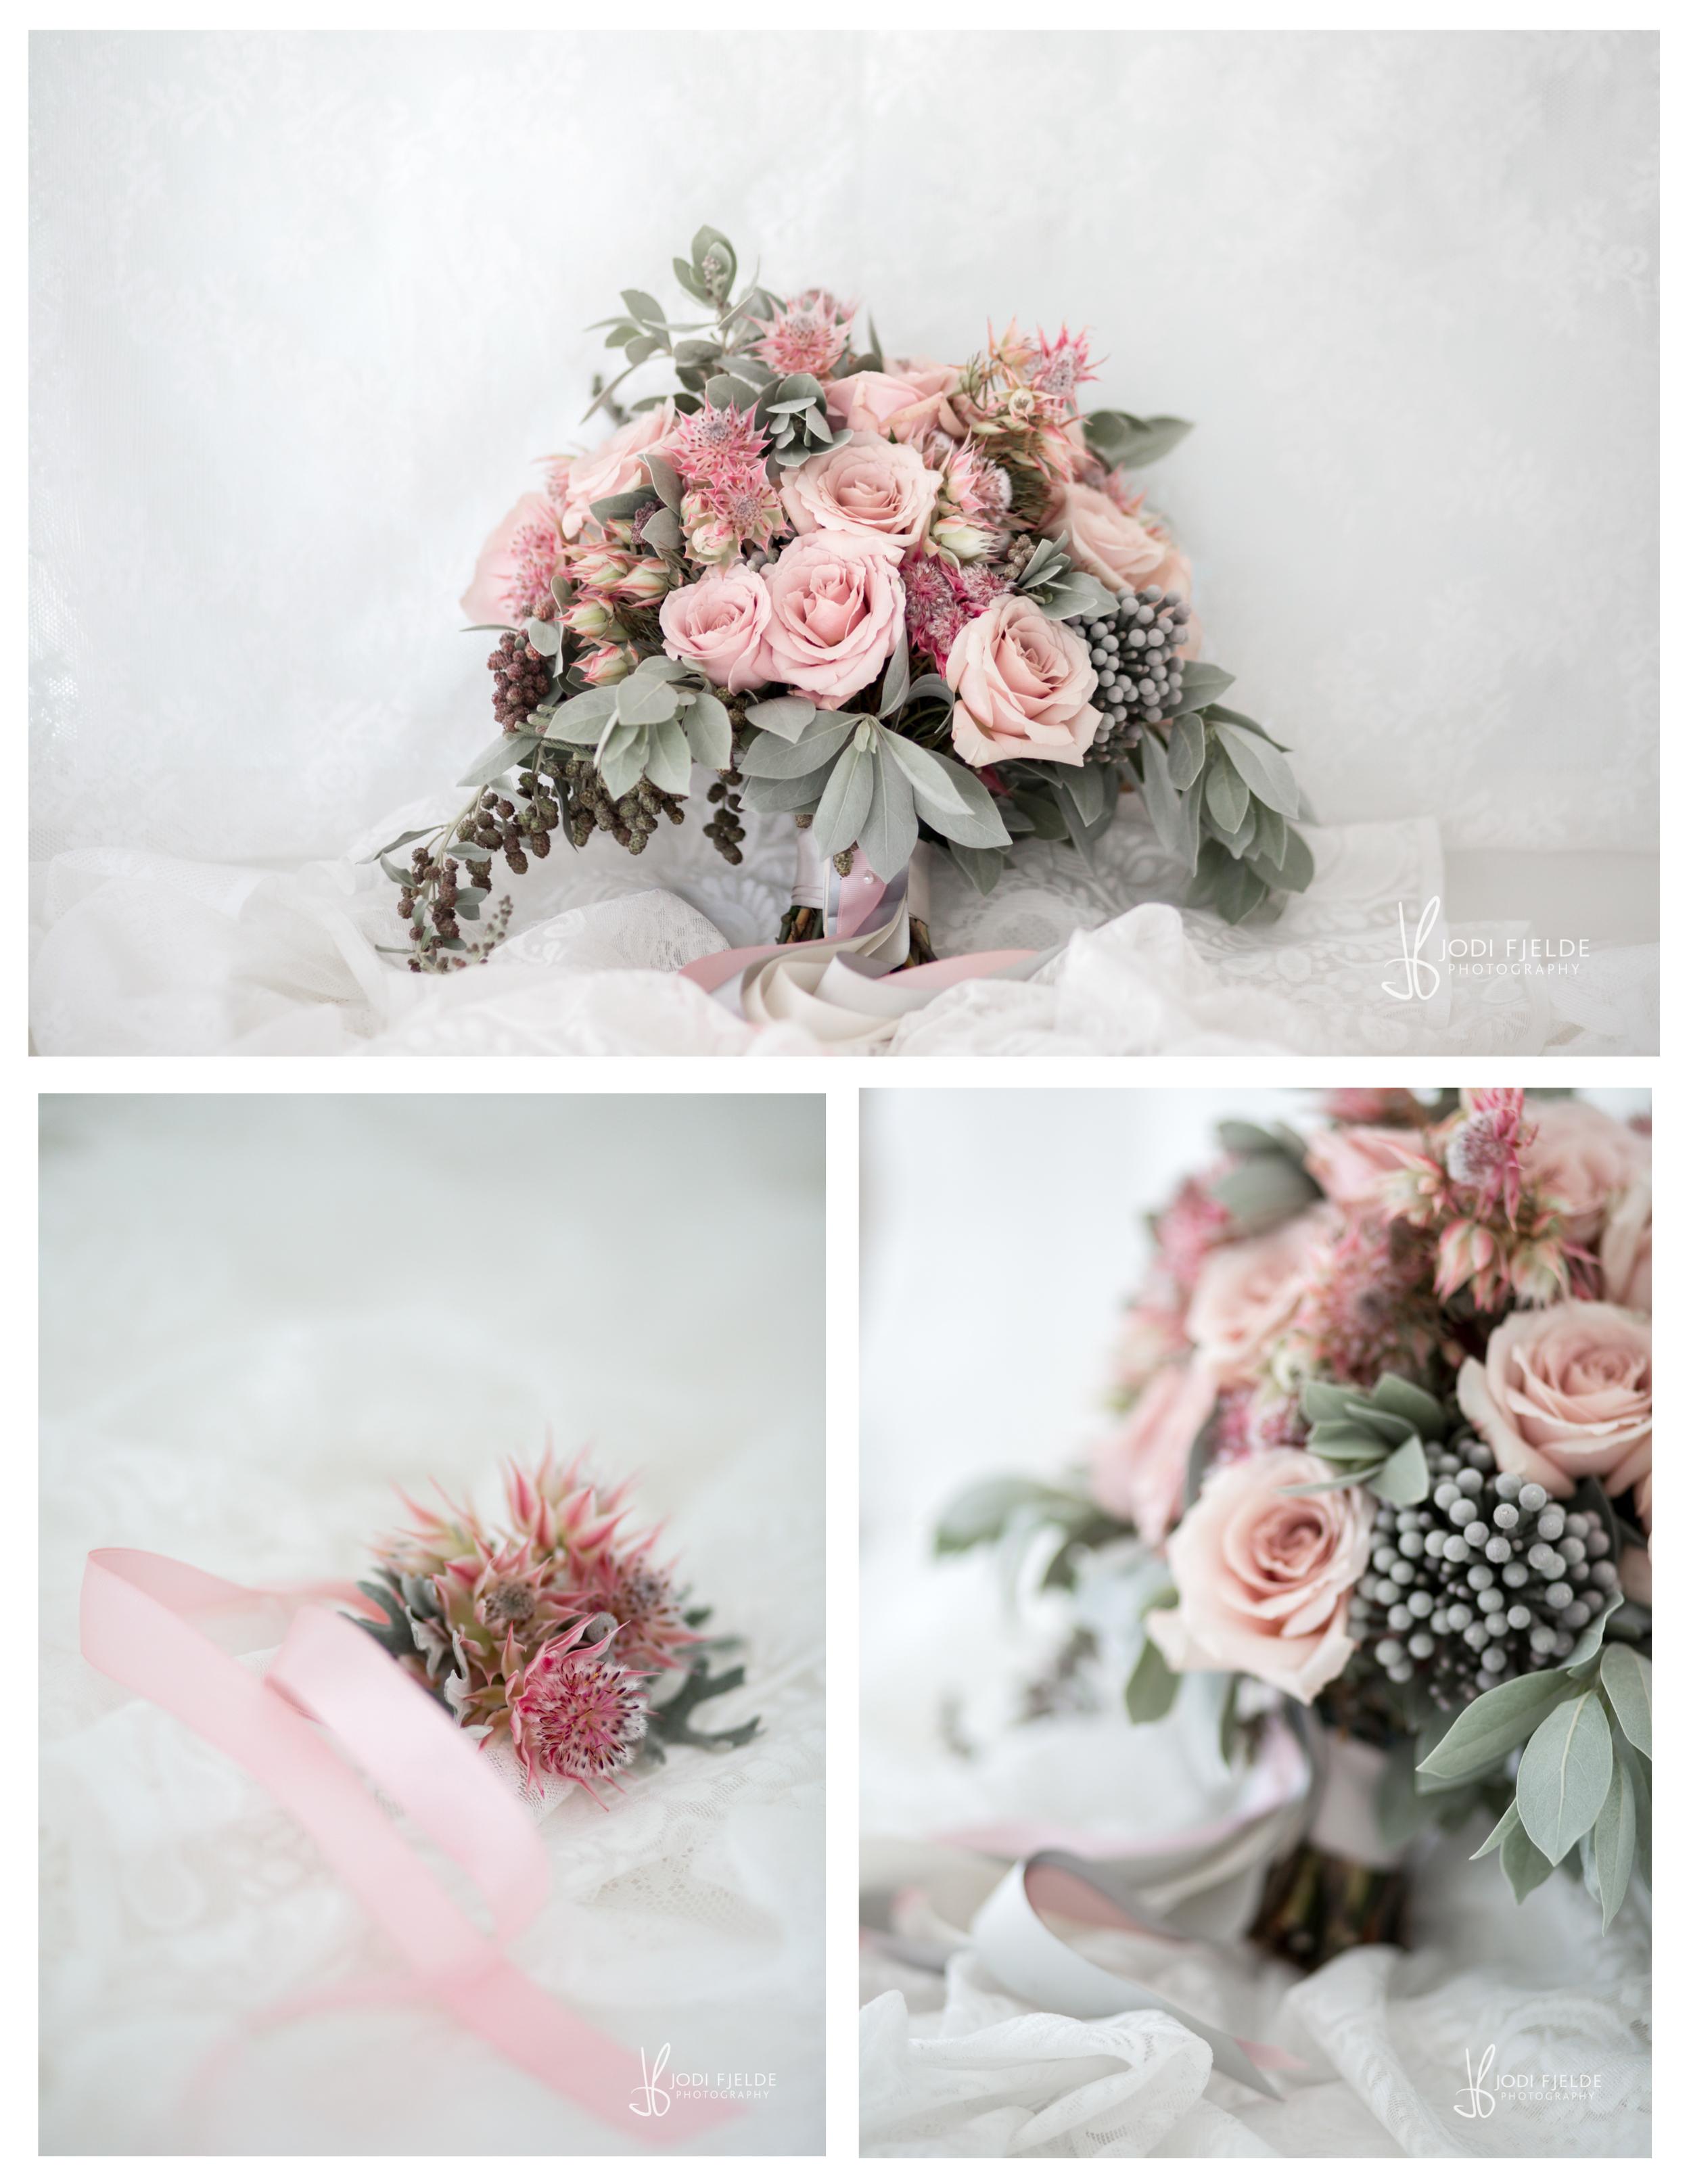 Parkland_Commercial_Business_Branding_Photography_Flowerly Studio_Jodi_Fjelde_Photogrpahy_9.jpg